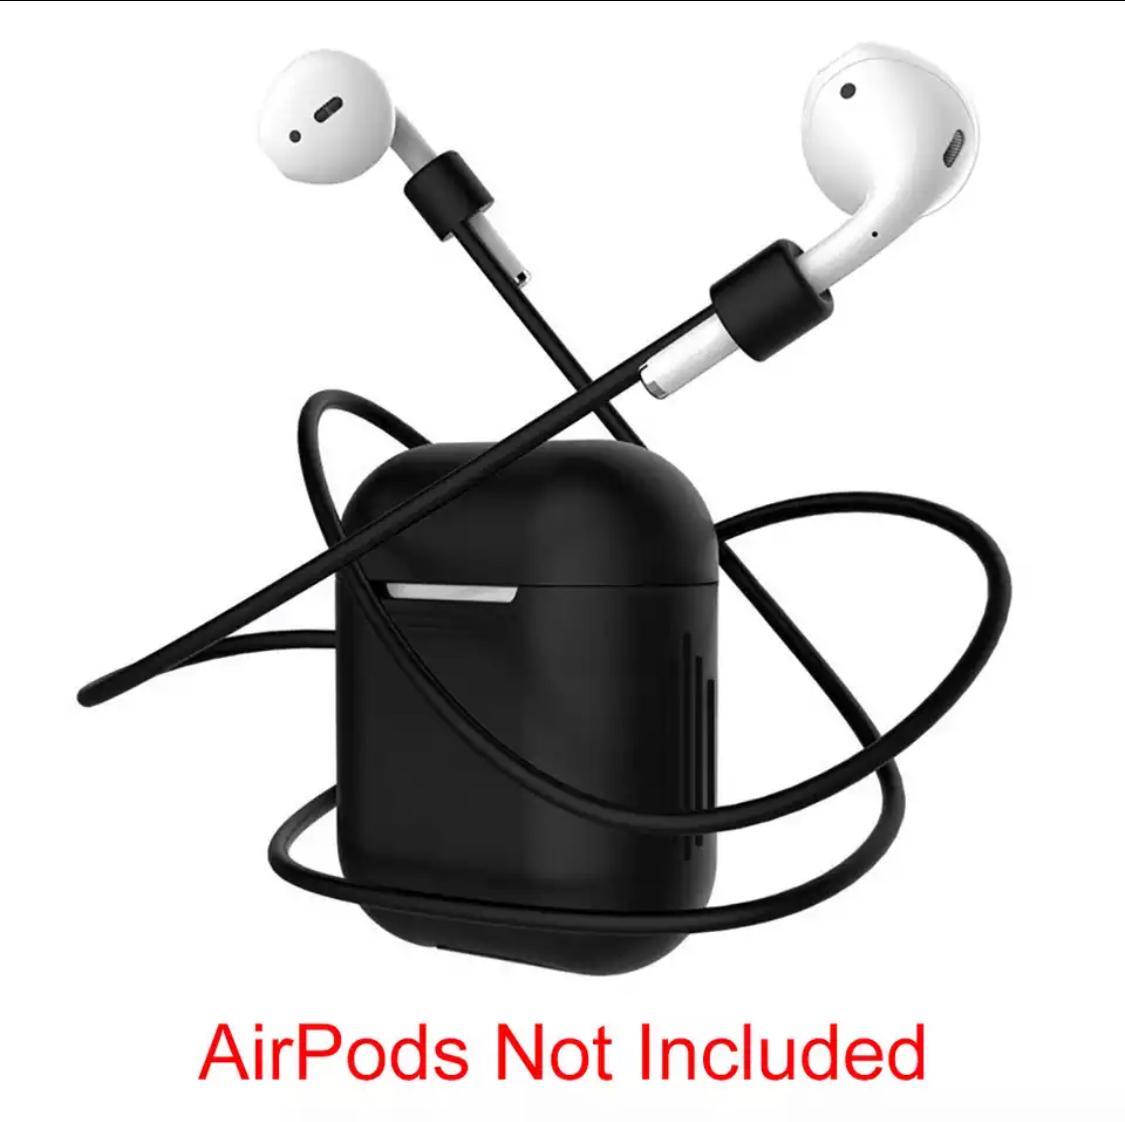 Anti-lost Bluetooth headphone Case Airpods Soft Silicone Black